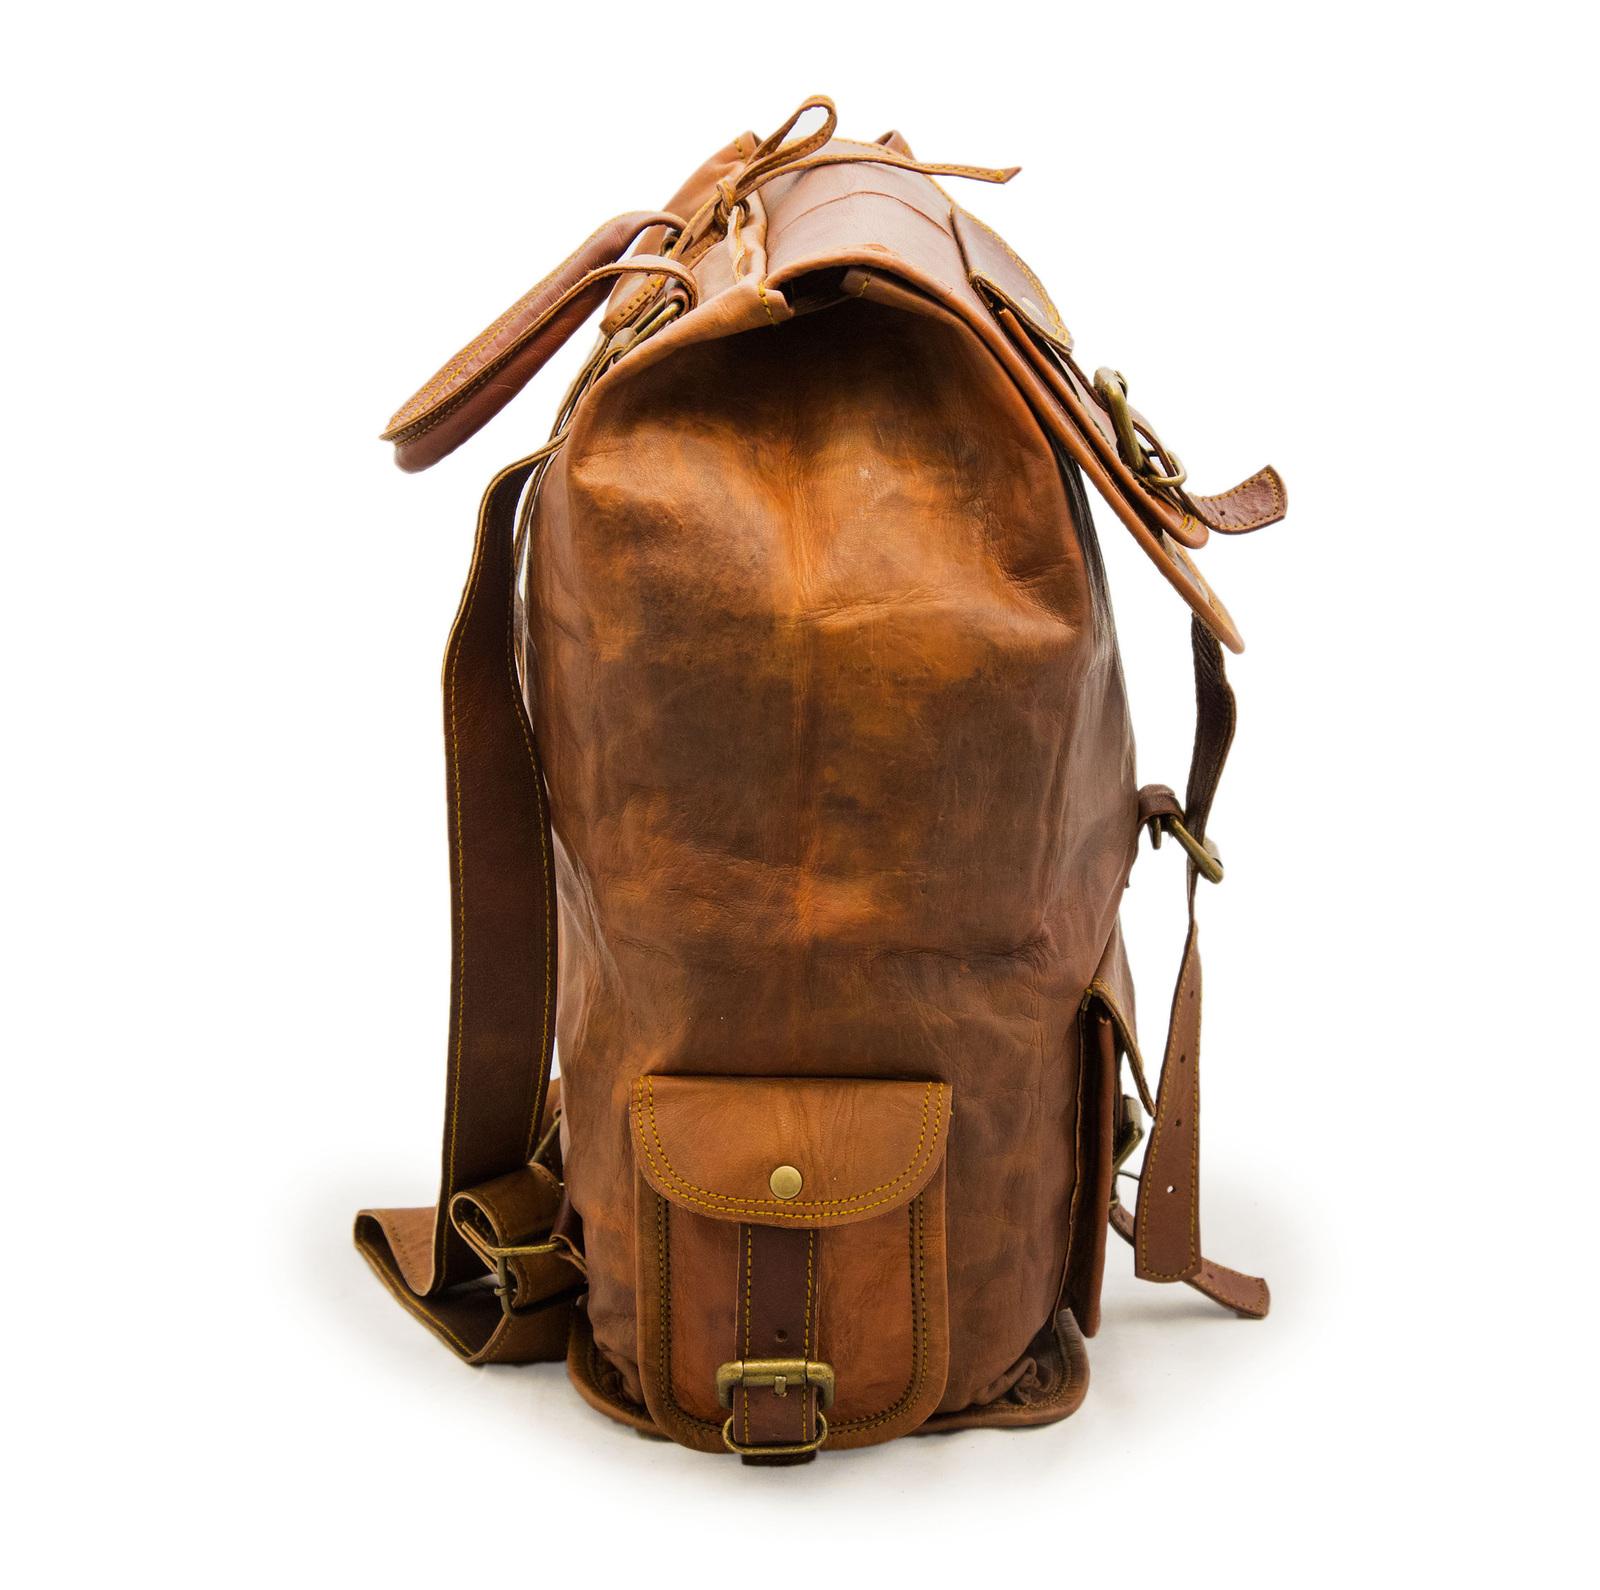 16″ Ladies Leather Backpack Knapsack For Travel & Laptop image 2